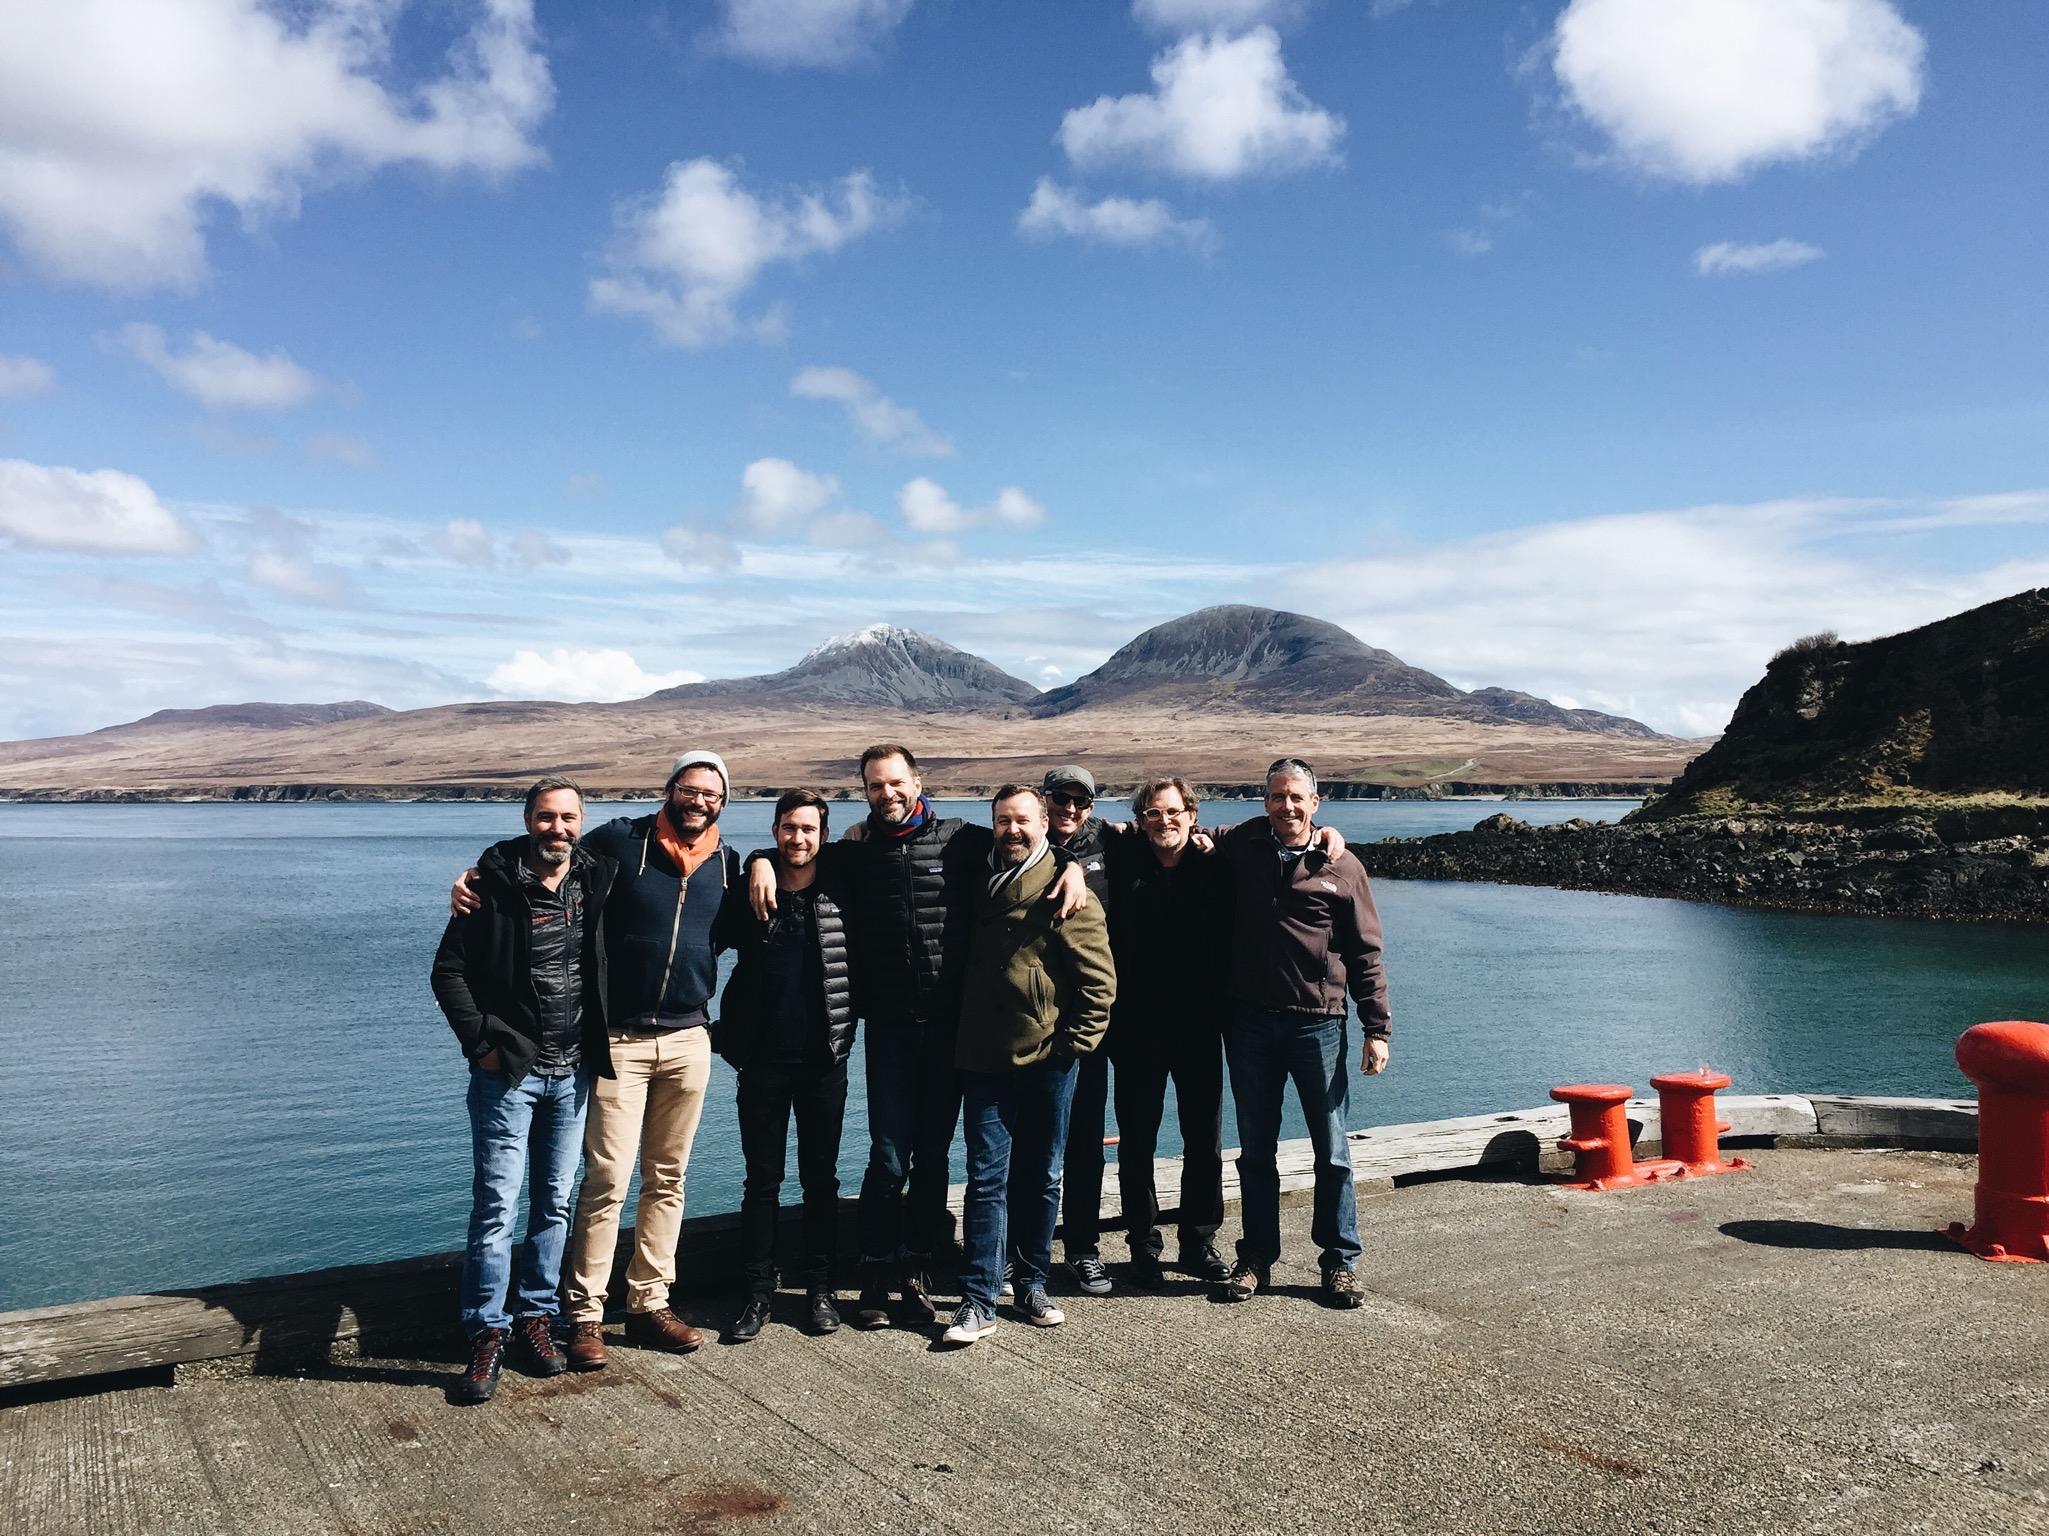 The Skerrol's Boys at our favorite distillery